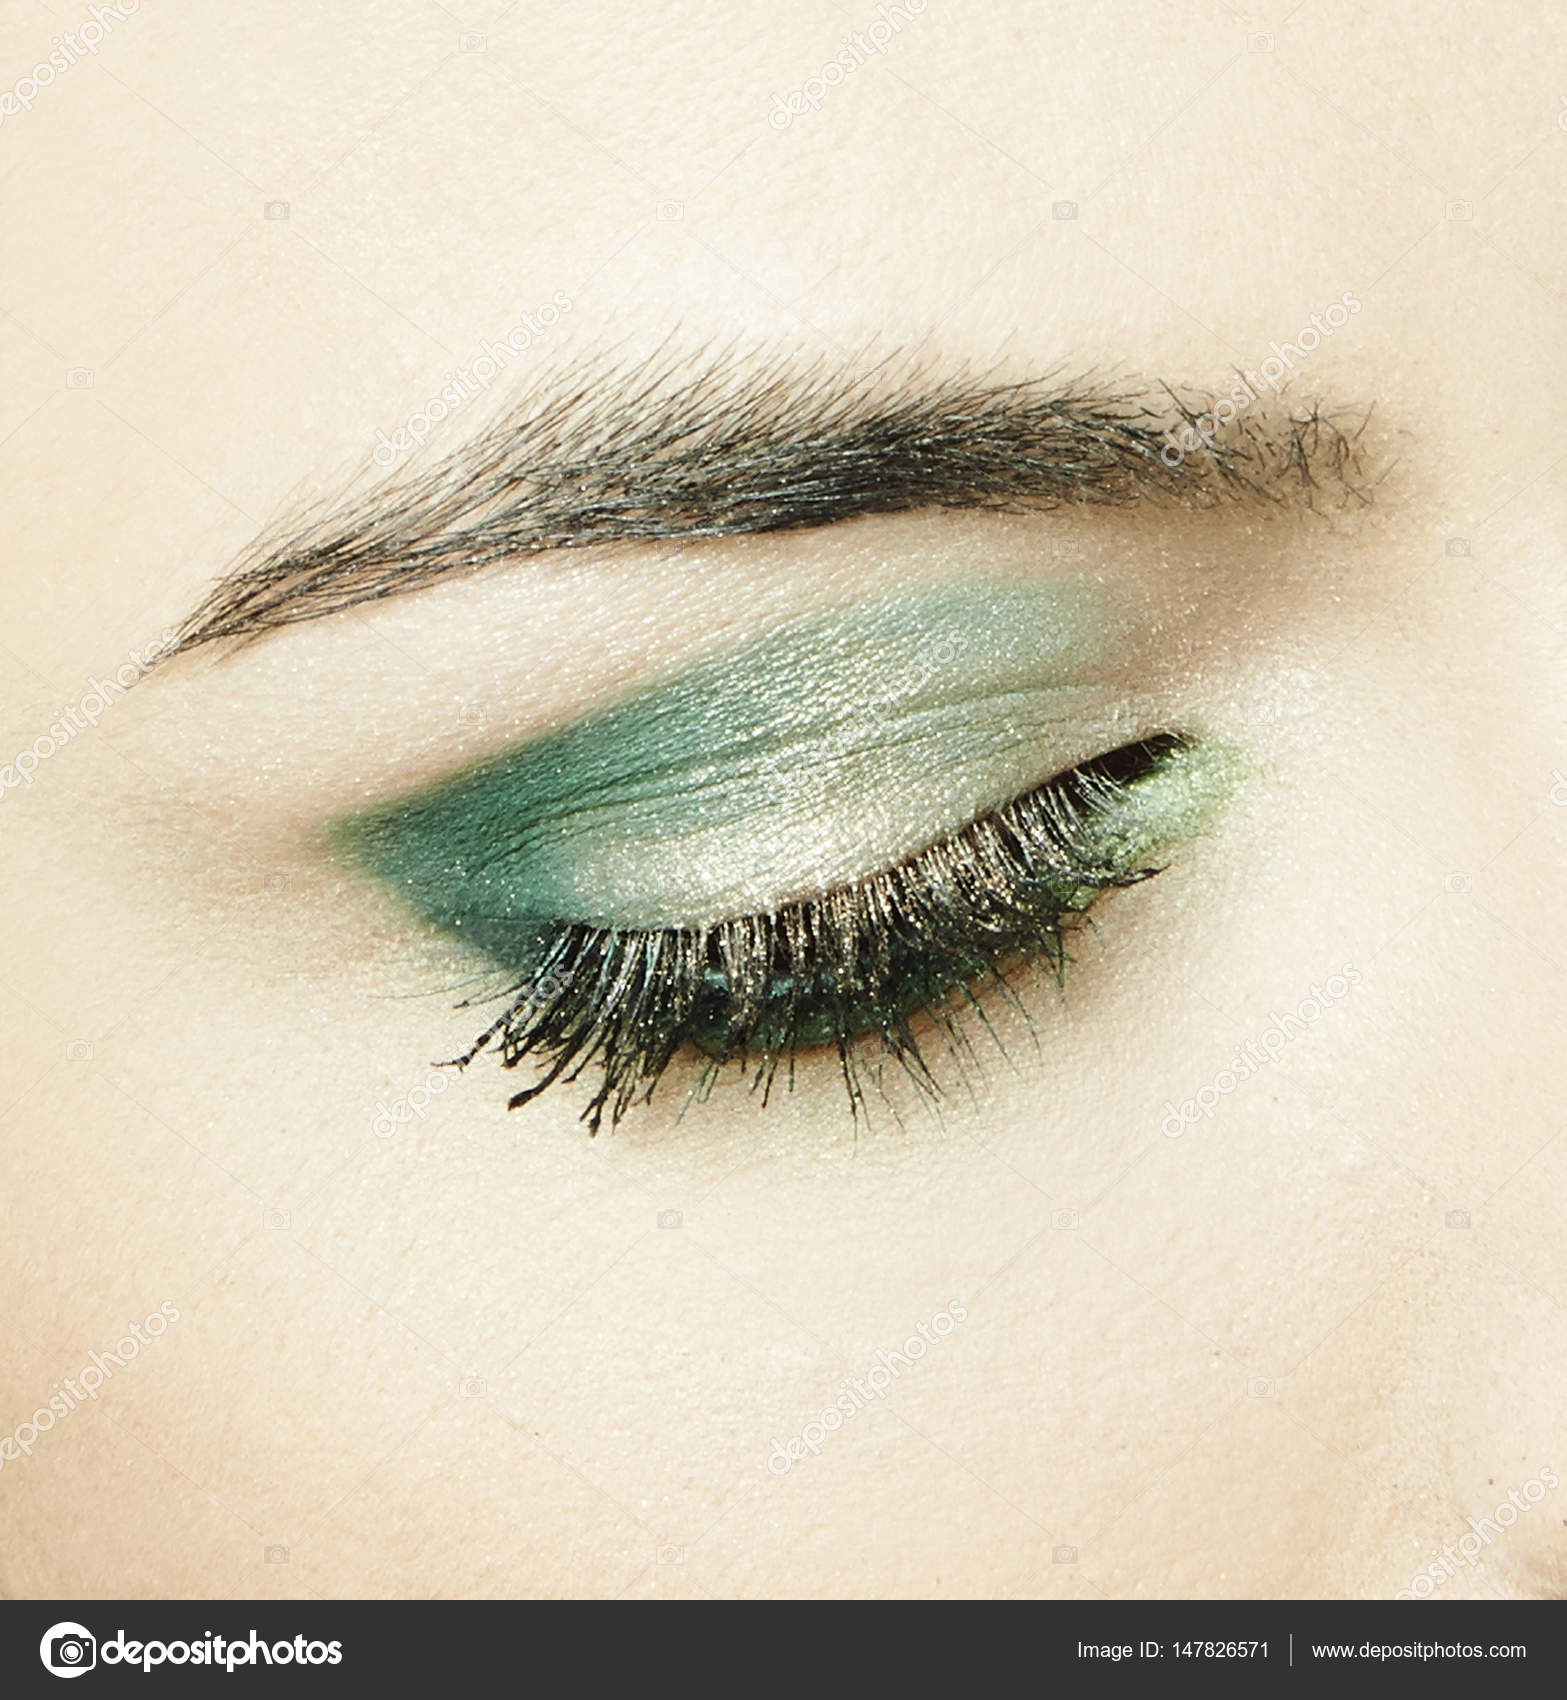 Auge Mit Grunen Lidschatten Stockfoto C Annadeba 147826571